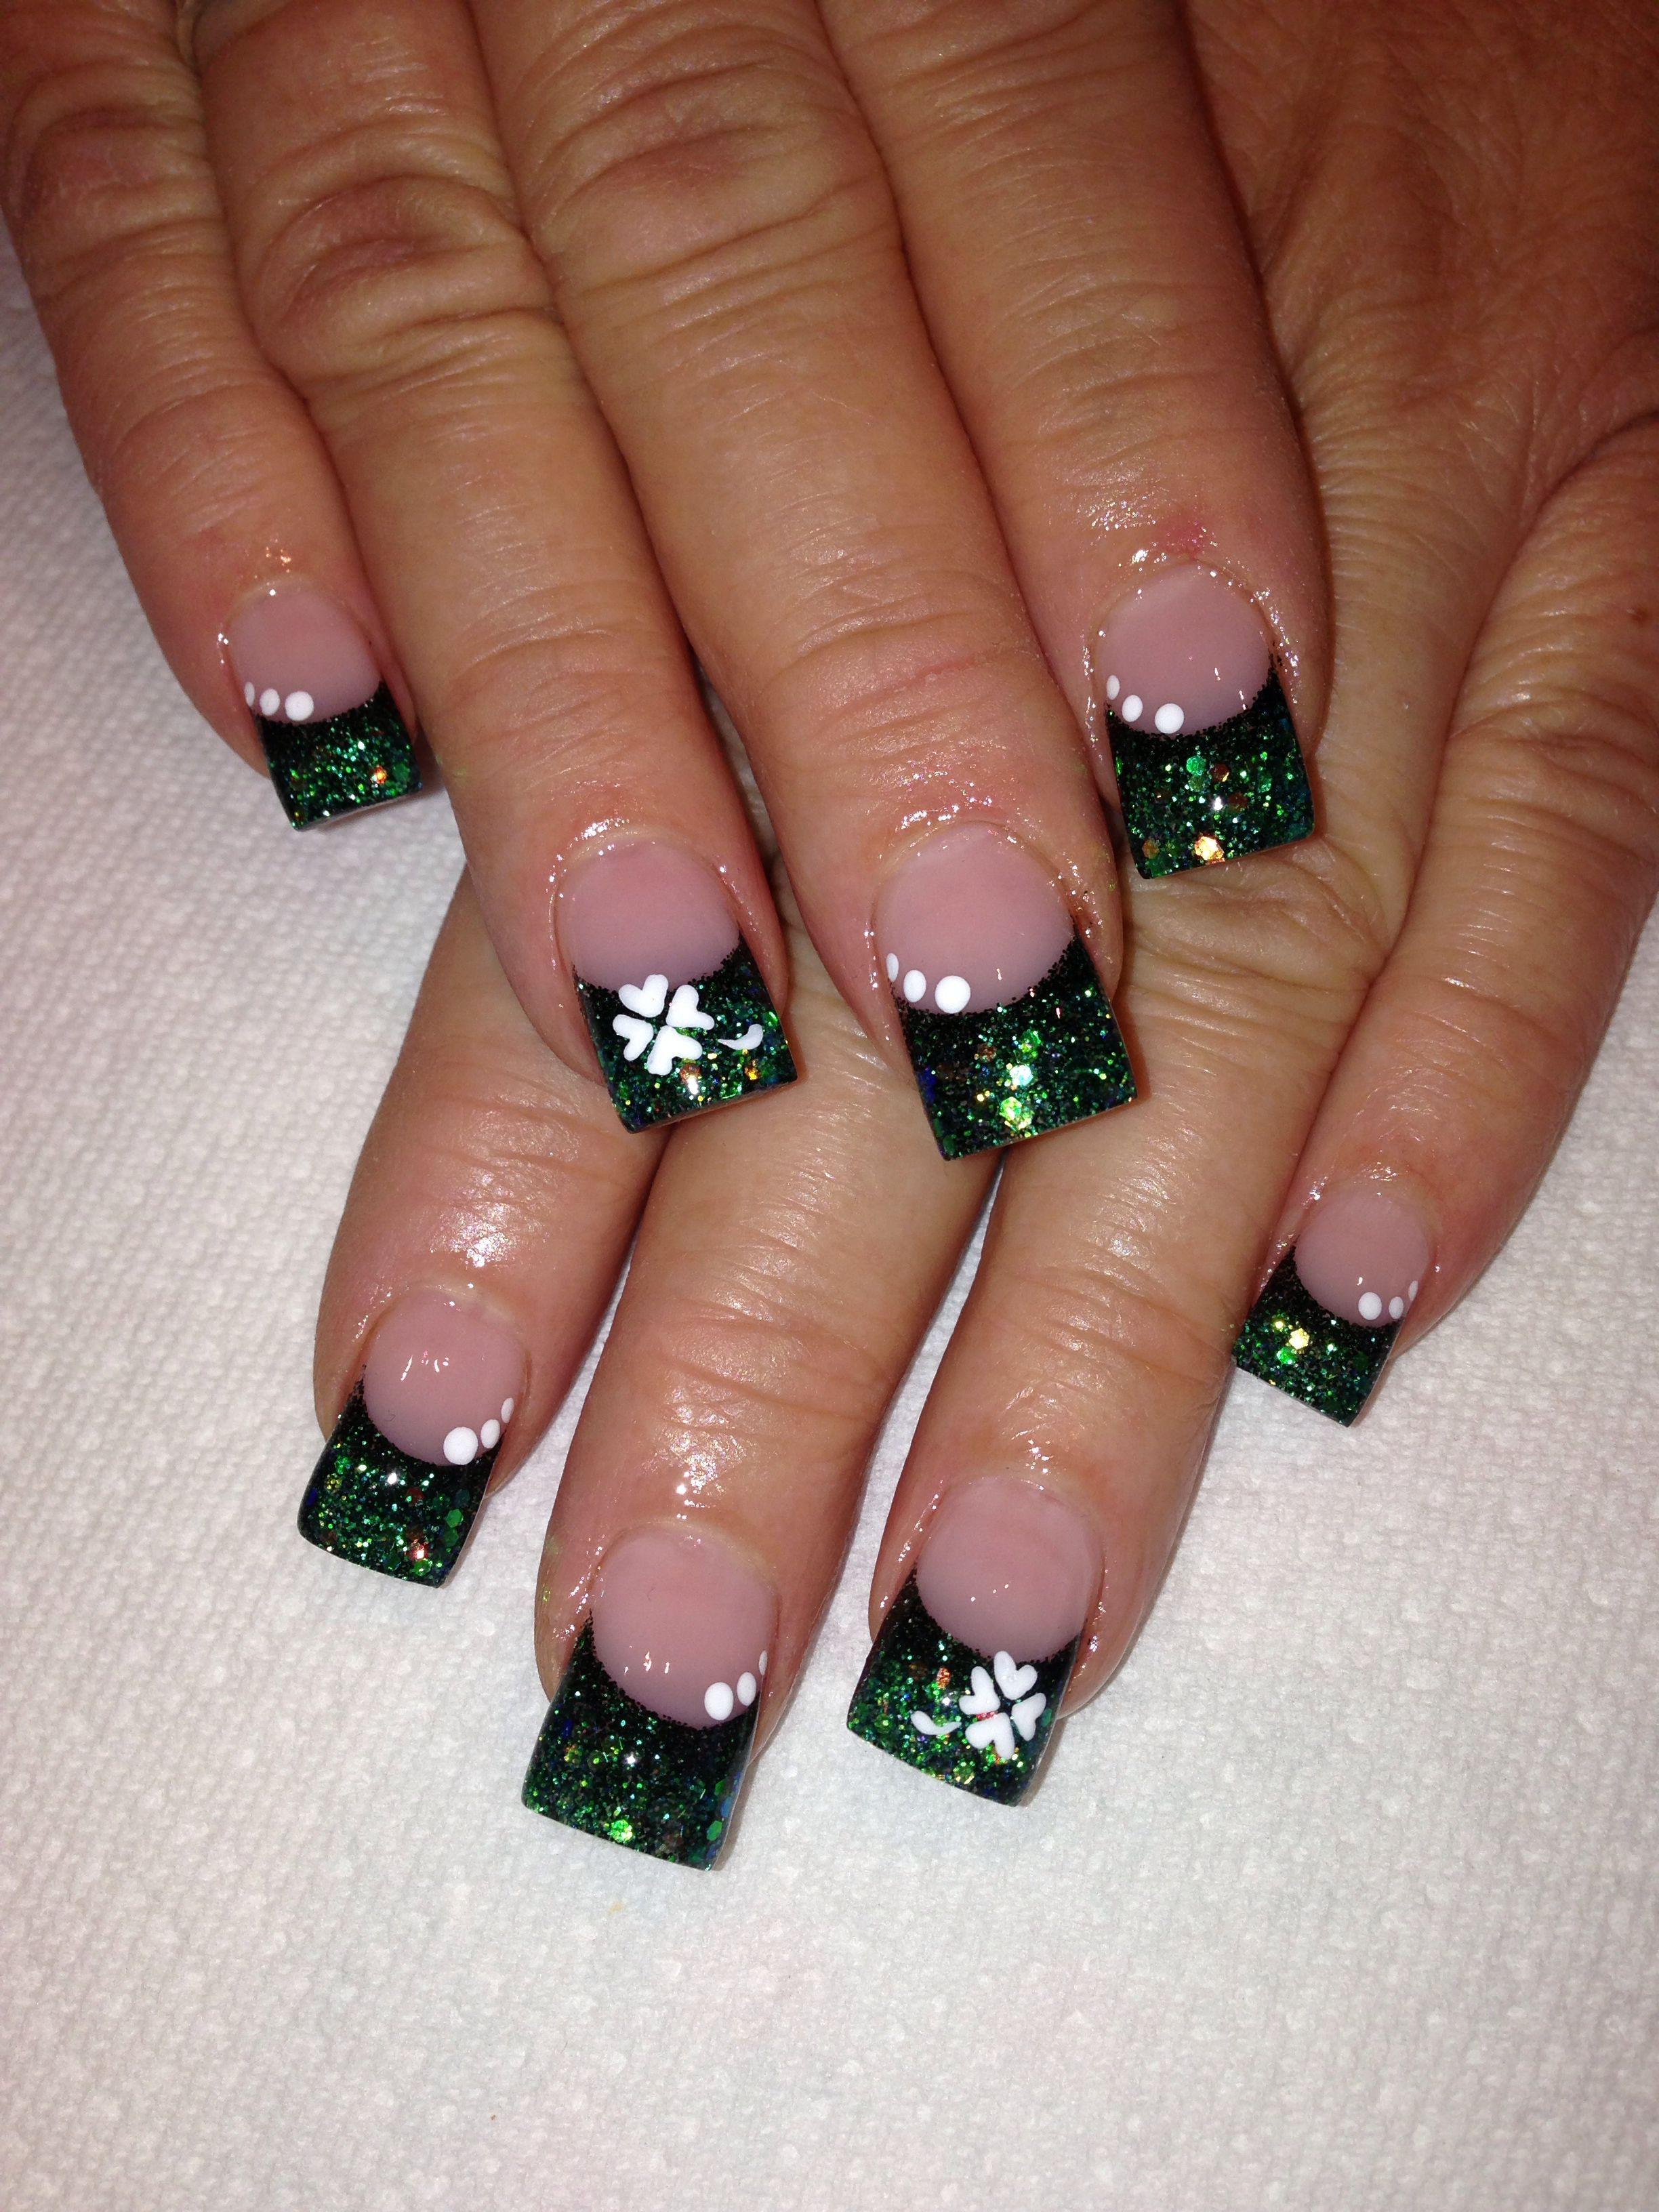 St Patricks Day Nail Art Like My Facebook Page Pinked Out Salon St Patricks Day Nails